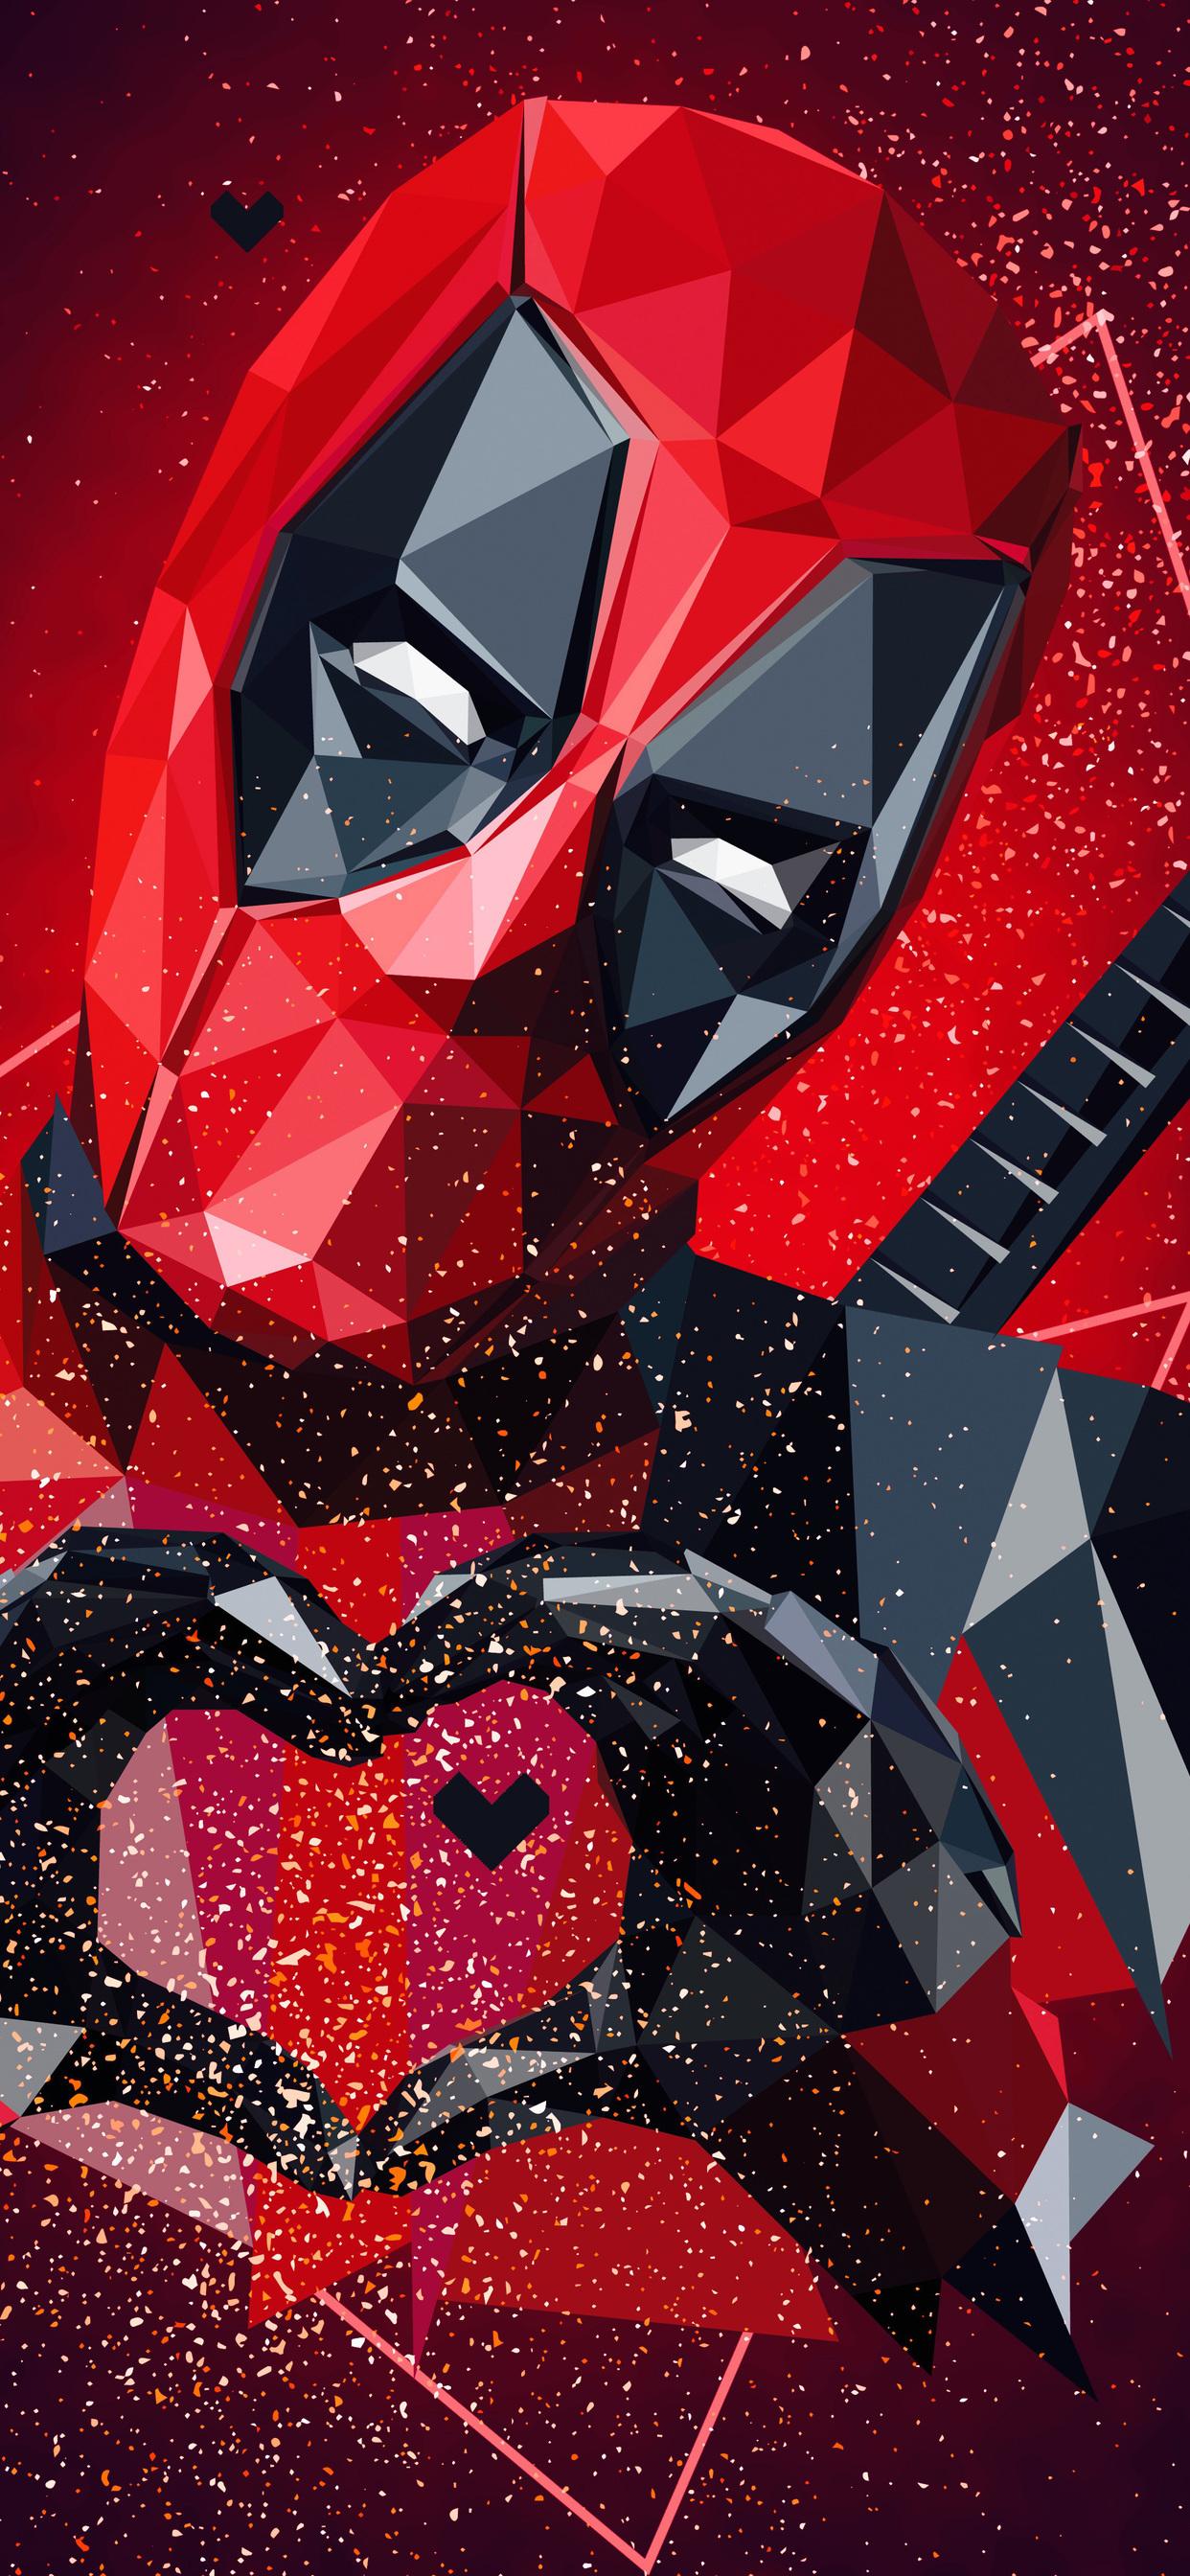 Deadpool Digital Art 4k Iphone Xs Max Hd 4k Deadpool Wallpaper 4k For Mobile 1242x2688 Wallpaper Teahub Io